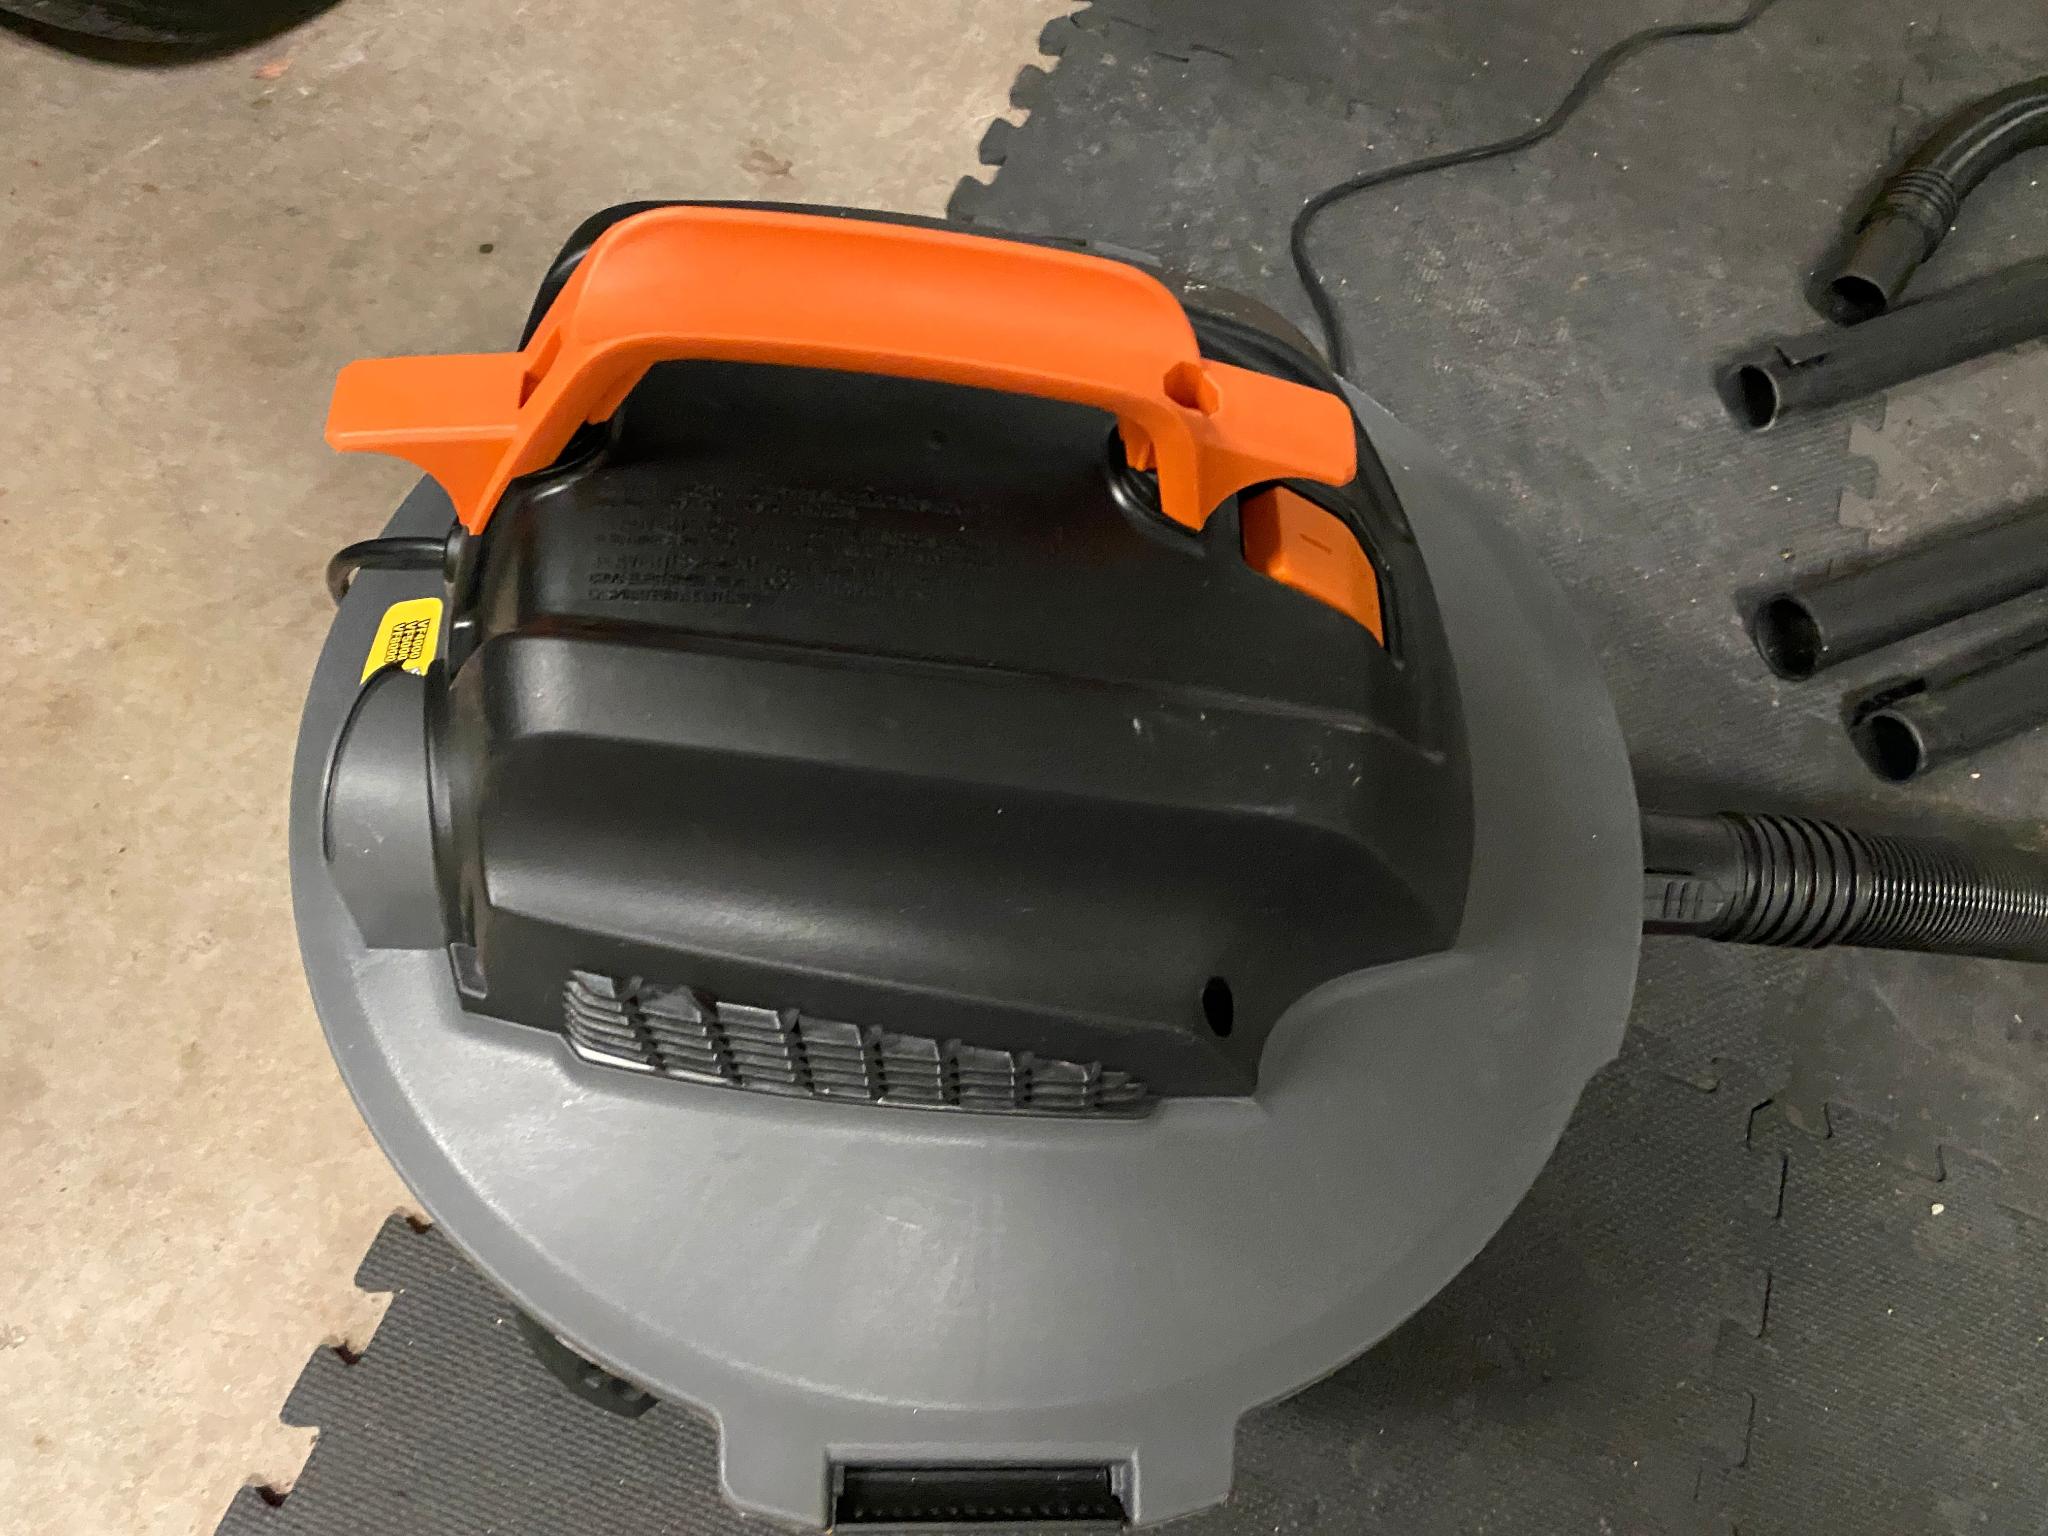 large ergonomic handle of RIDGID shop vac